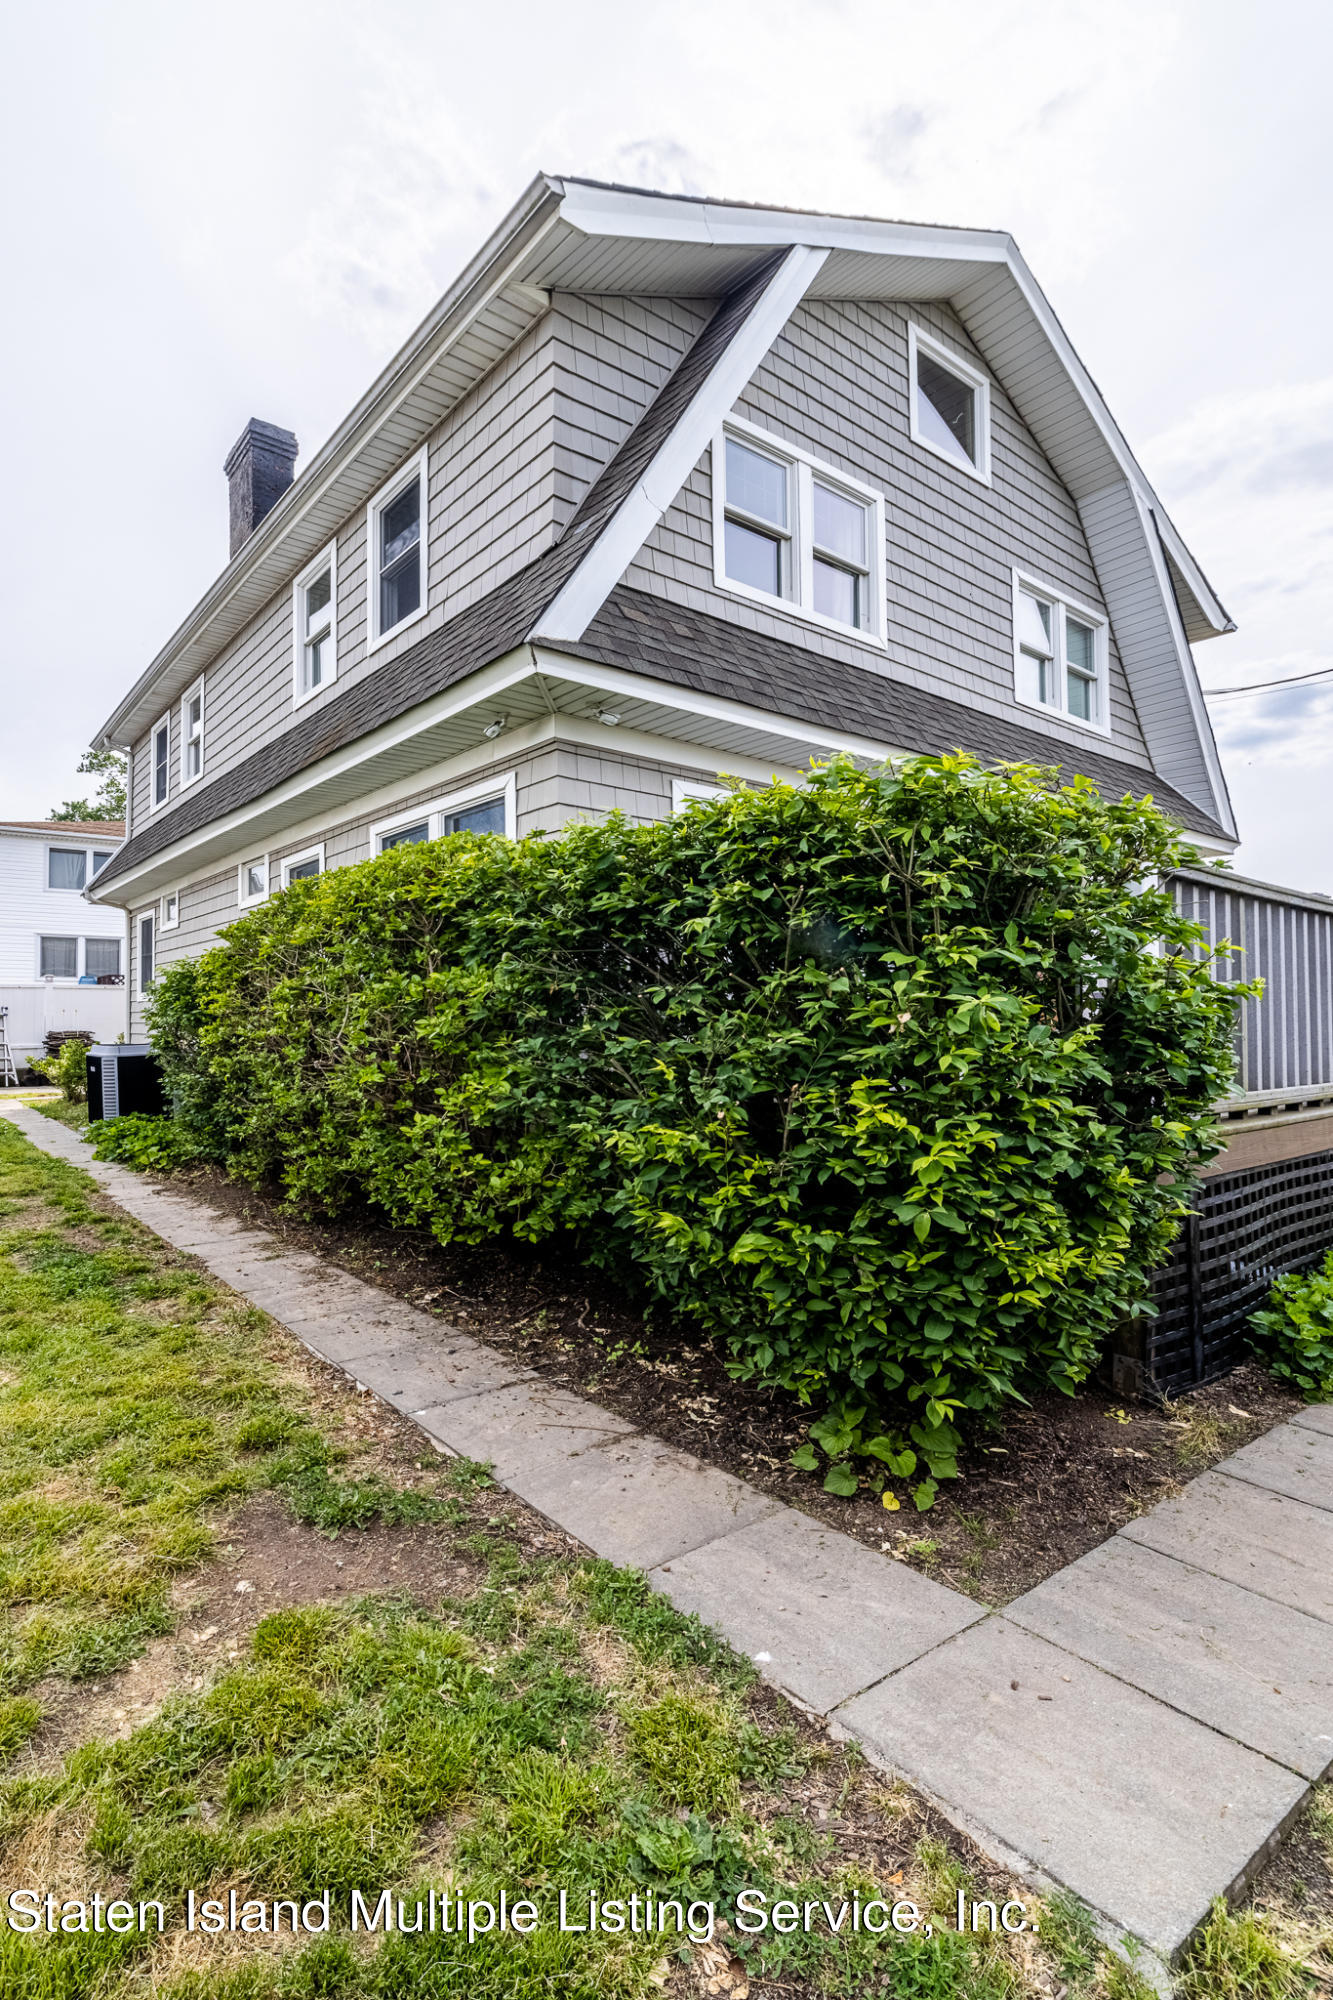 Single Family - Detached 790 New Dorp Lane  Staten Island, NY 10306, MLS-1146574-5